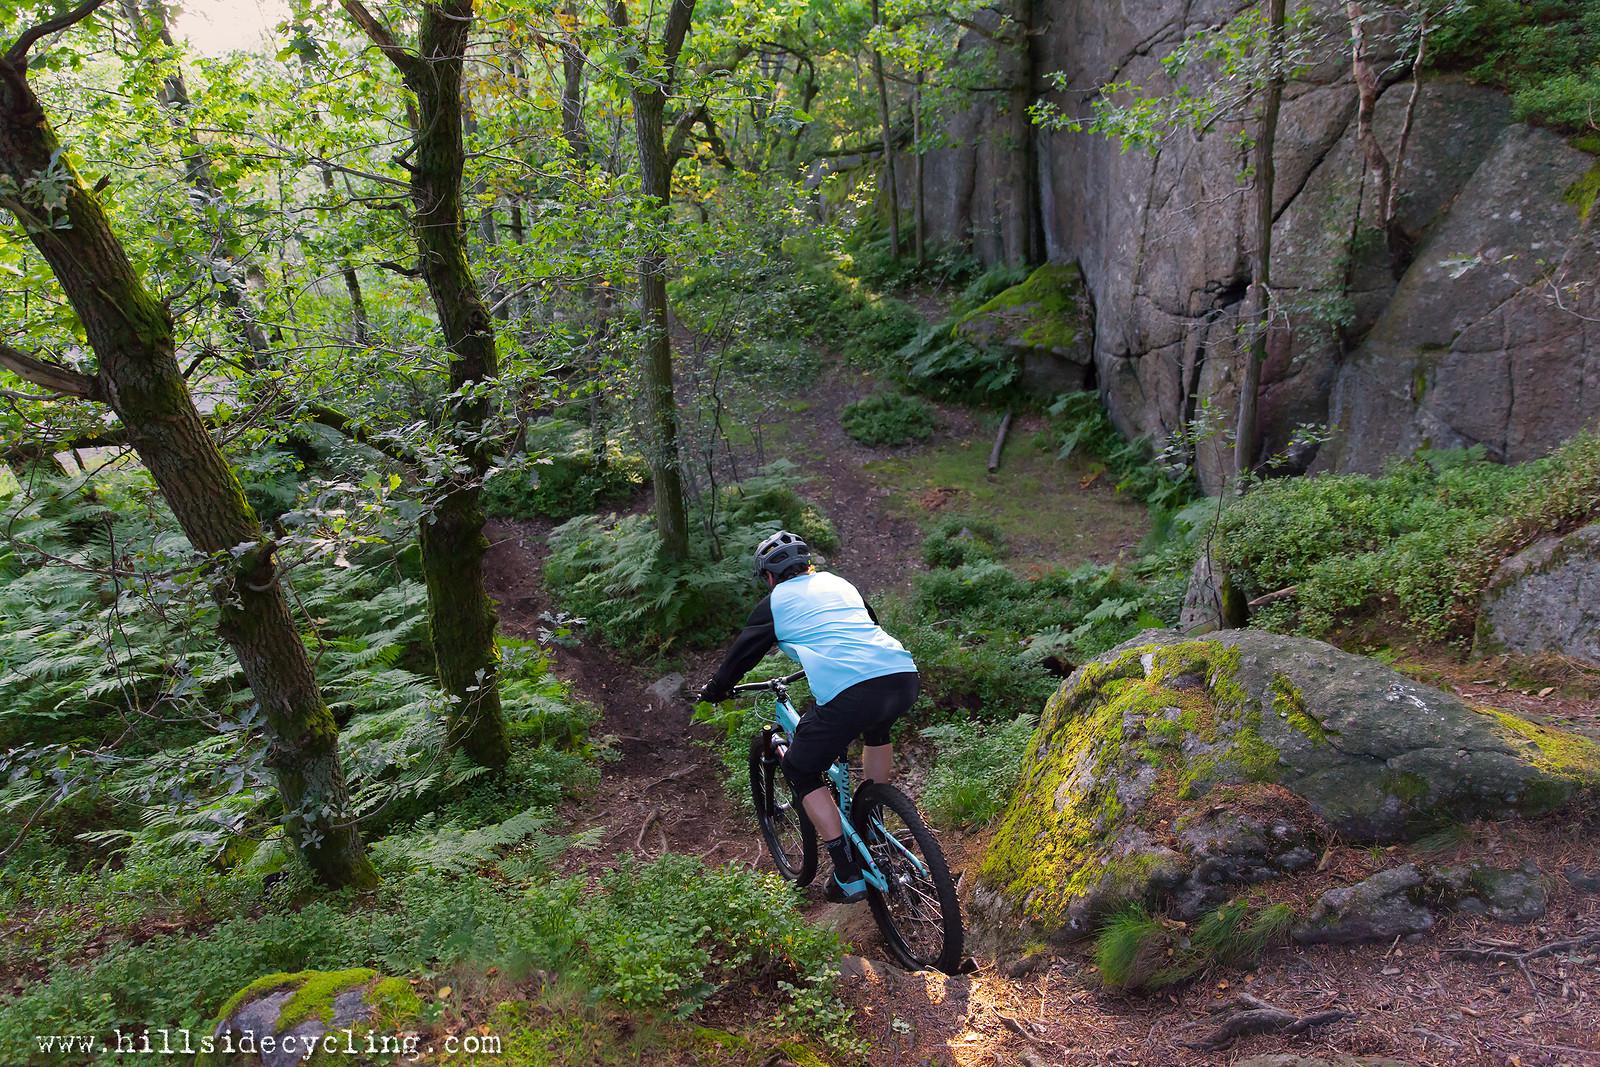 Evening Ride, Gothenburg, Sweden - Hillside Cycling - Mountain Biking Pictures - Vital MTB